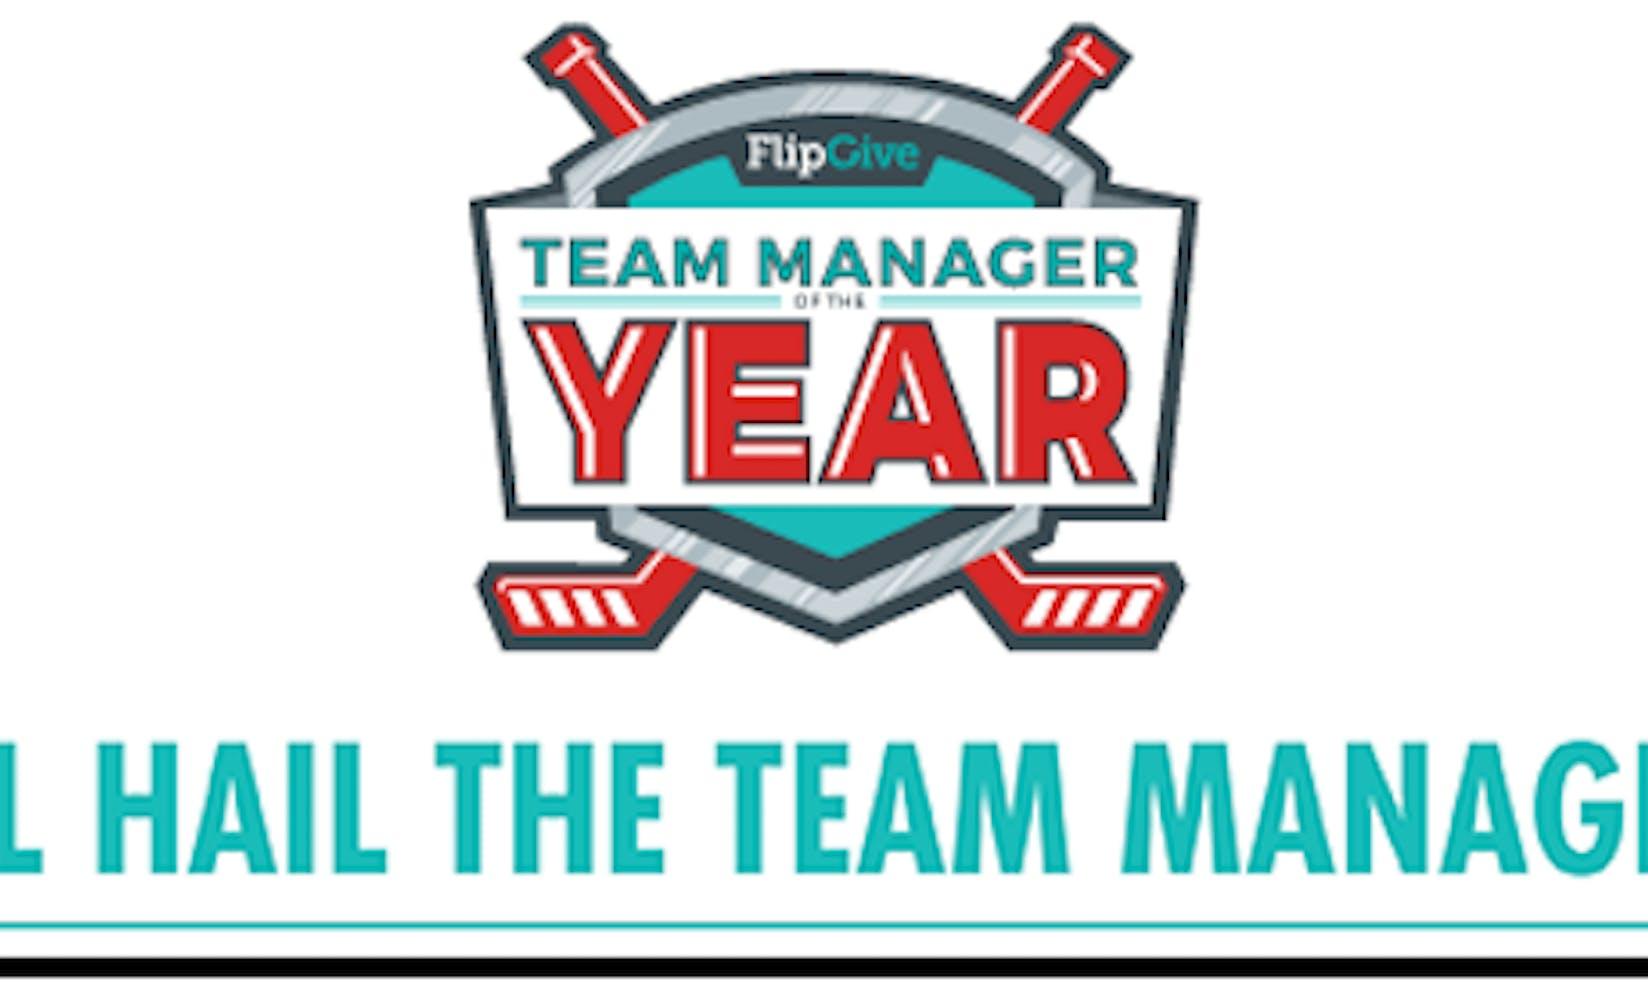 Teammanager allhail